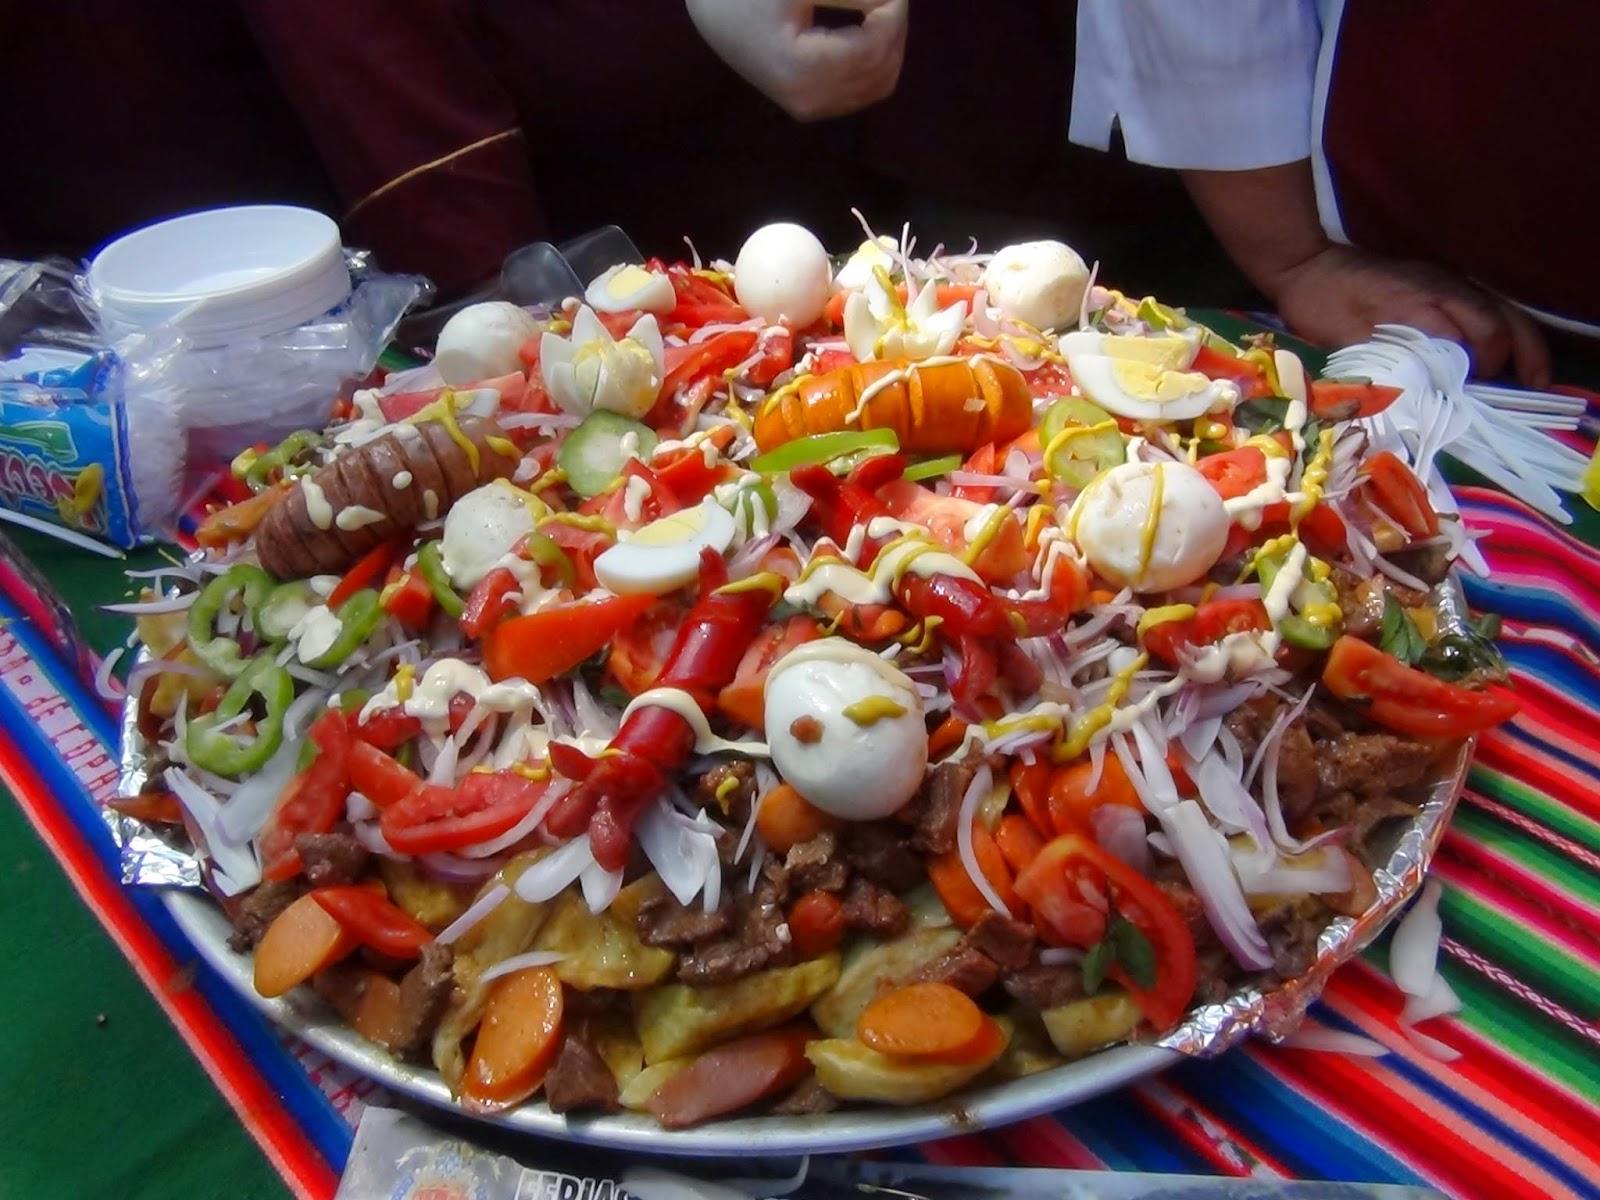 feria-del-pique-macho-cochabamba-bolivia-cochabandido-blog